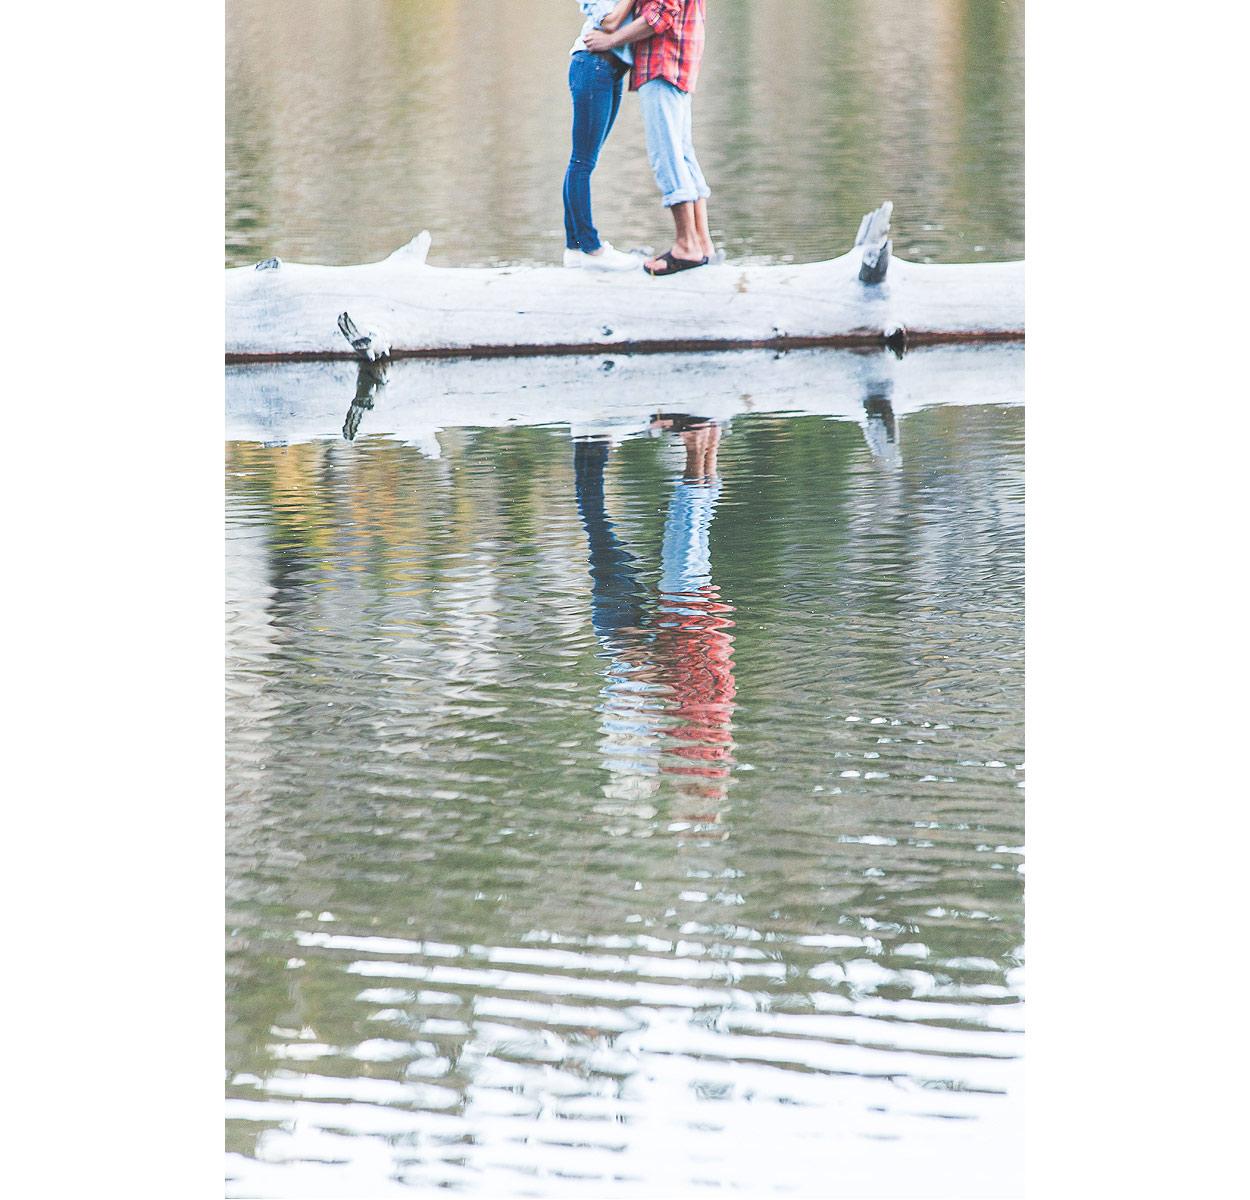 LoganUtahEngagementPhotography-TonyGroveEngagementPhotography-HeidiRandallStudios-Courtney+Sam-21.jpg